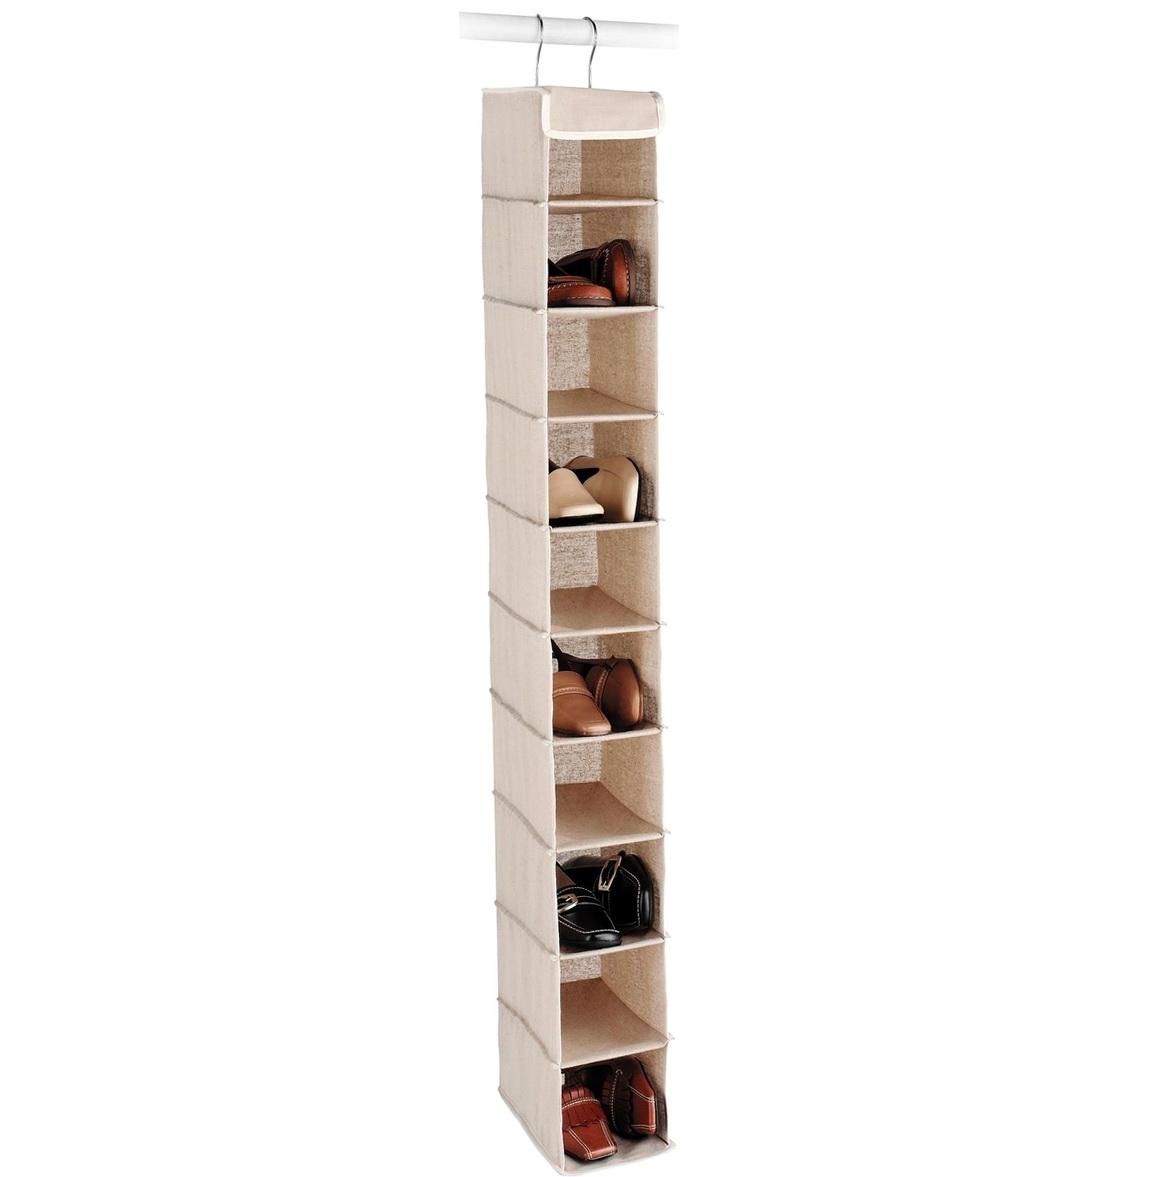 Walmart Shoe Racks Closet Storage Home Design Ideas